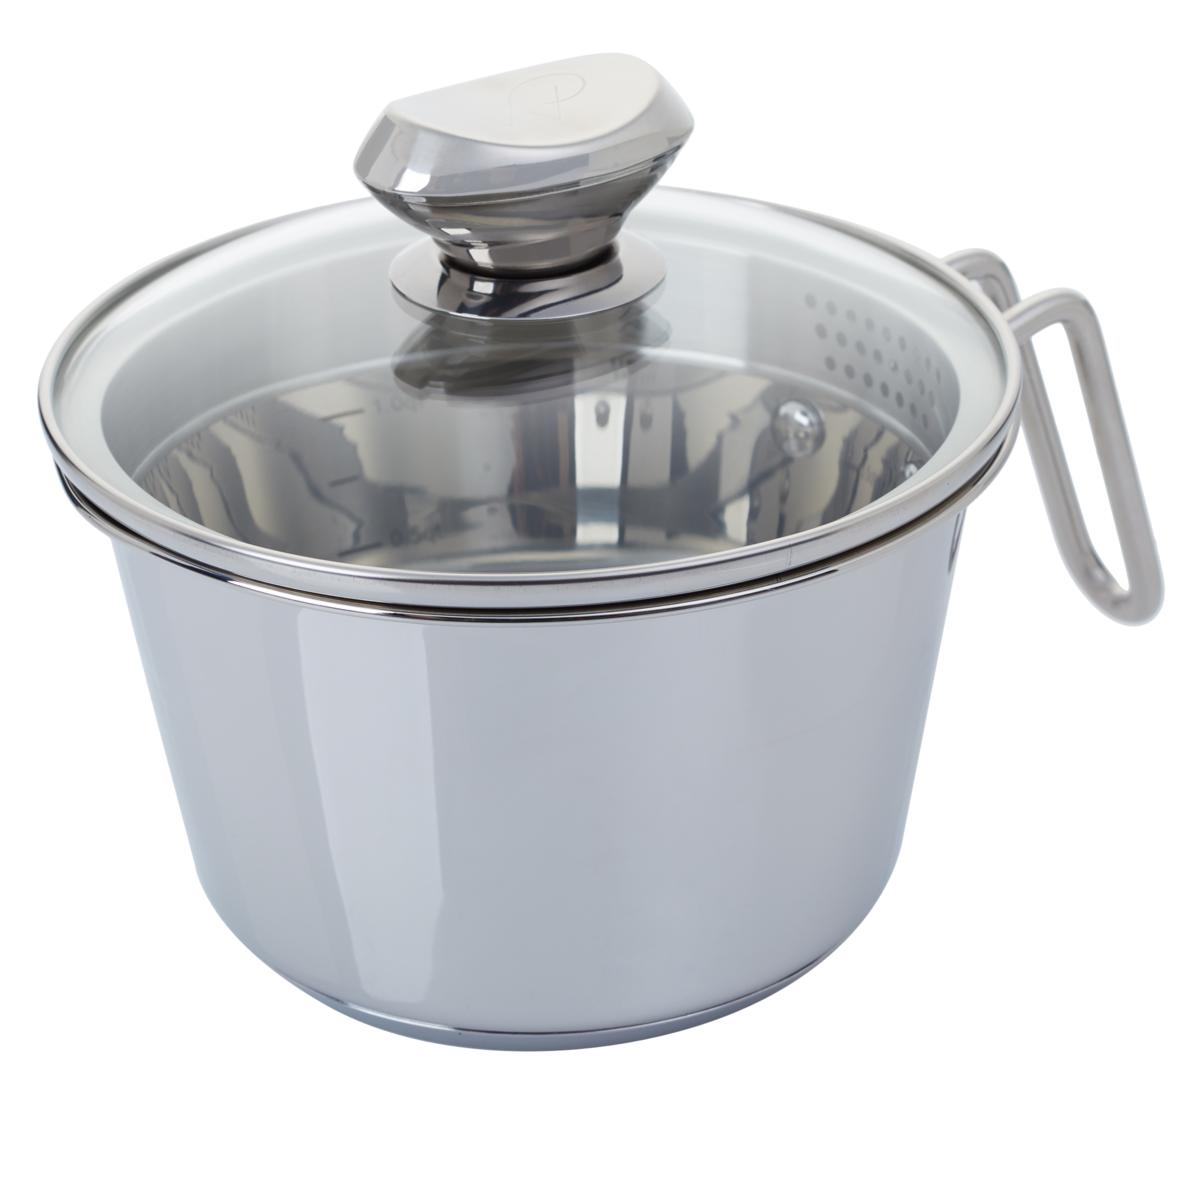 Wolfgang Puck 6 Cup Stainless Steel Pot With Colander Lid Model 696 792 Walmart Com Walmart Com